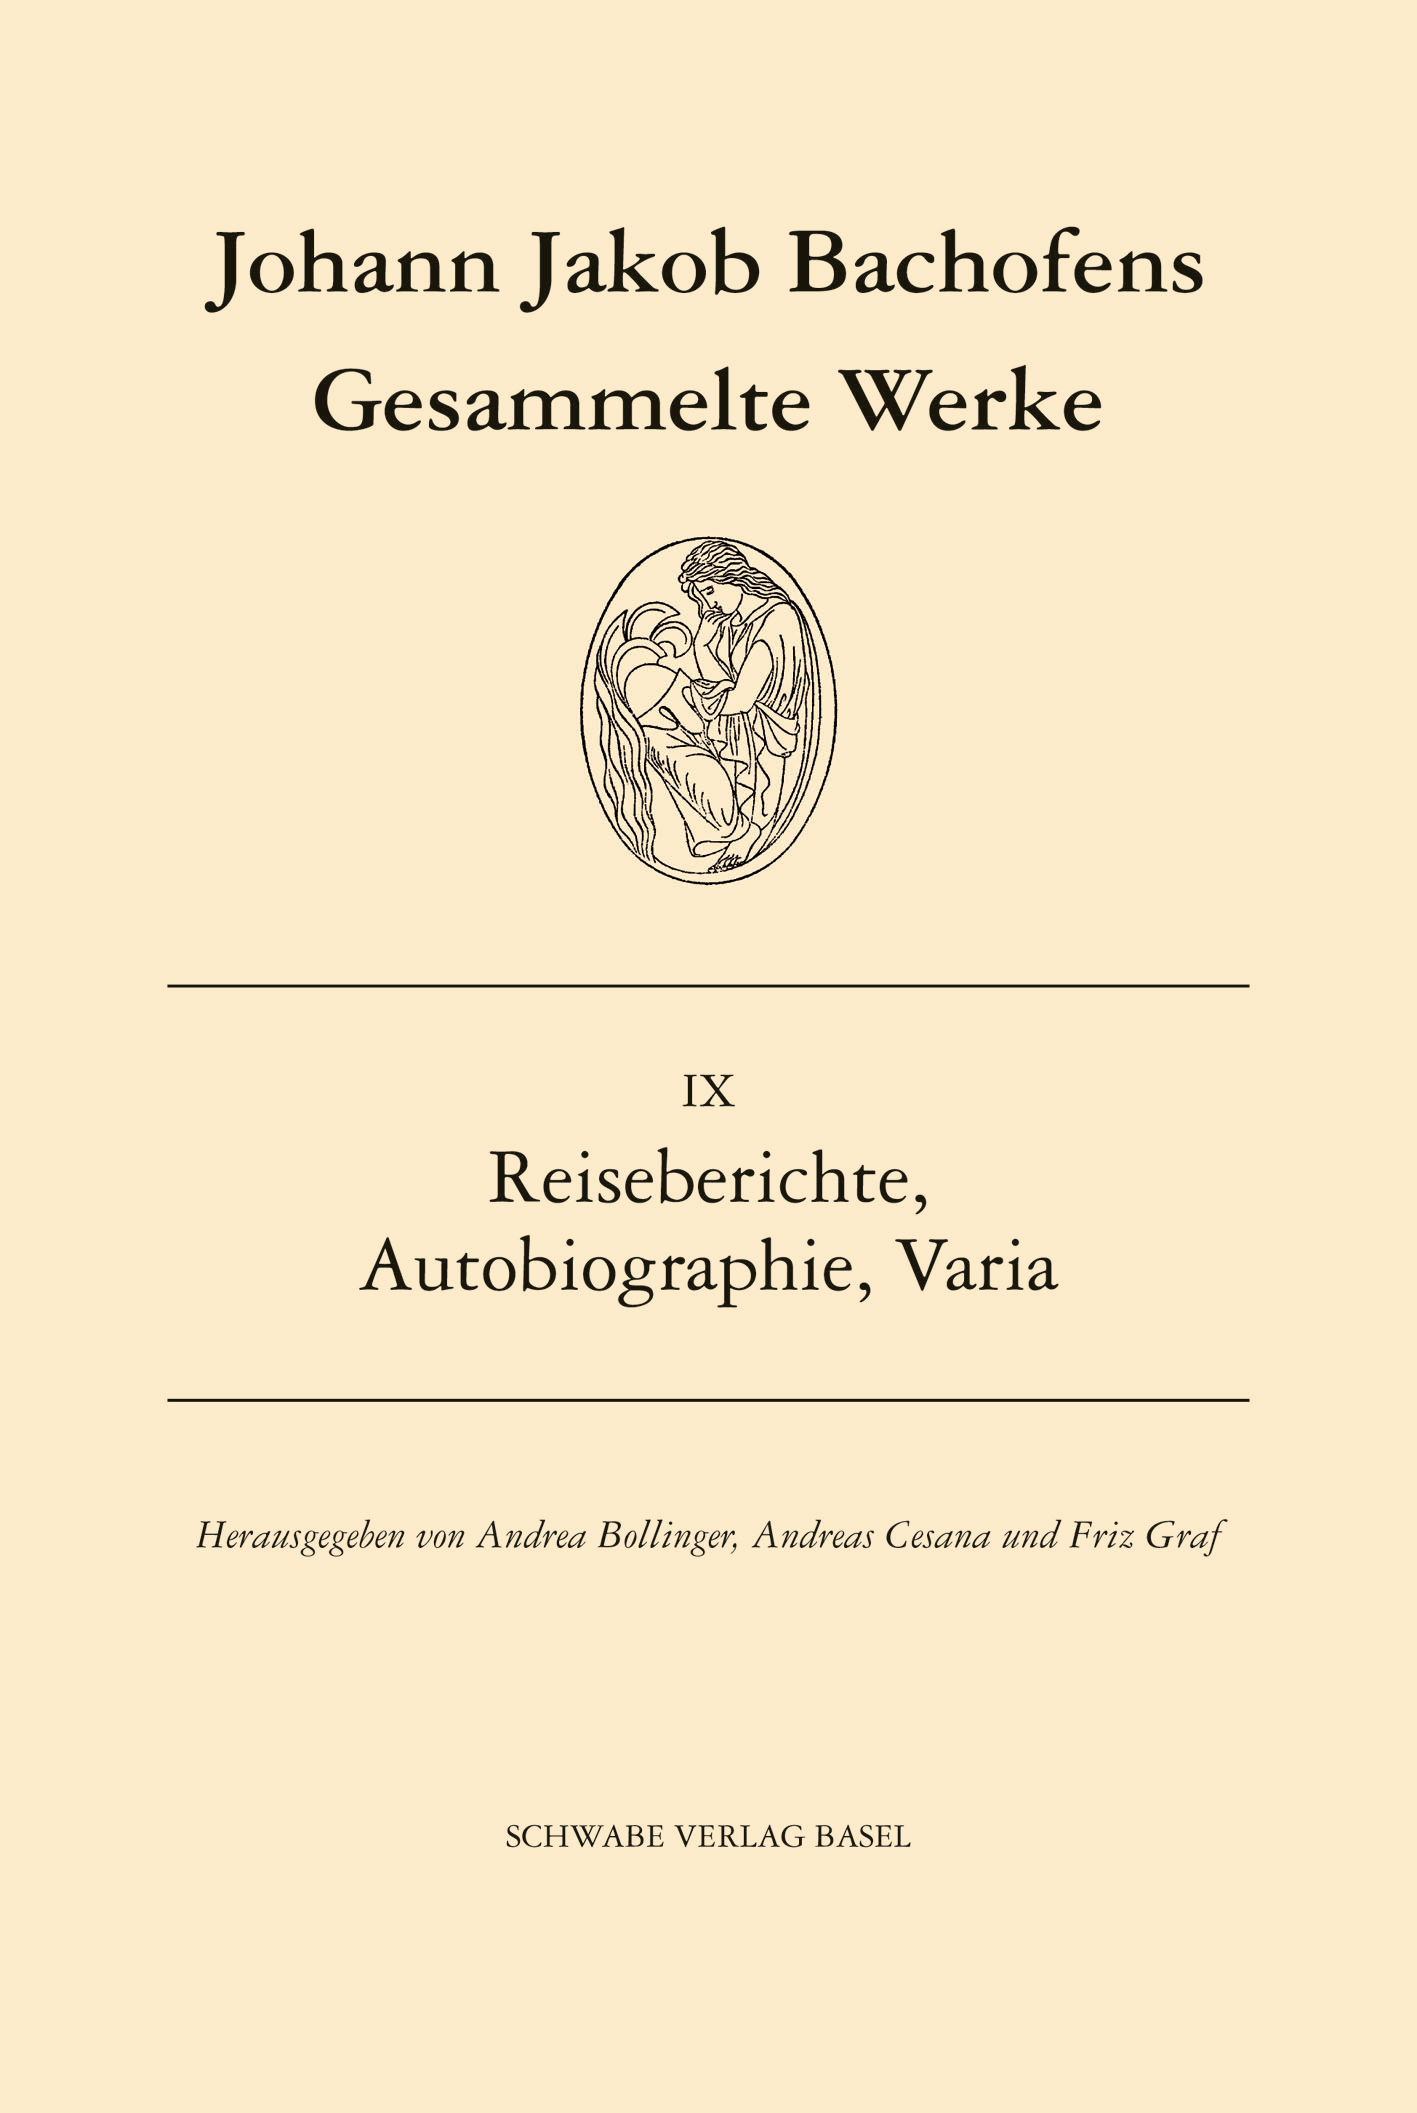 Johann Jakob Bachofens Gesammelte Werke (Leinen)